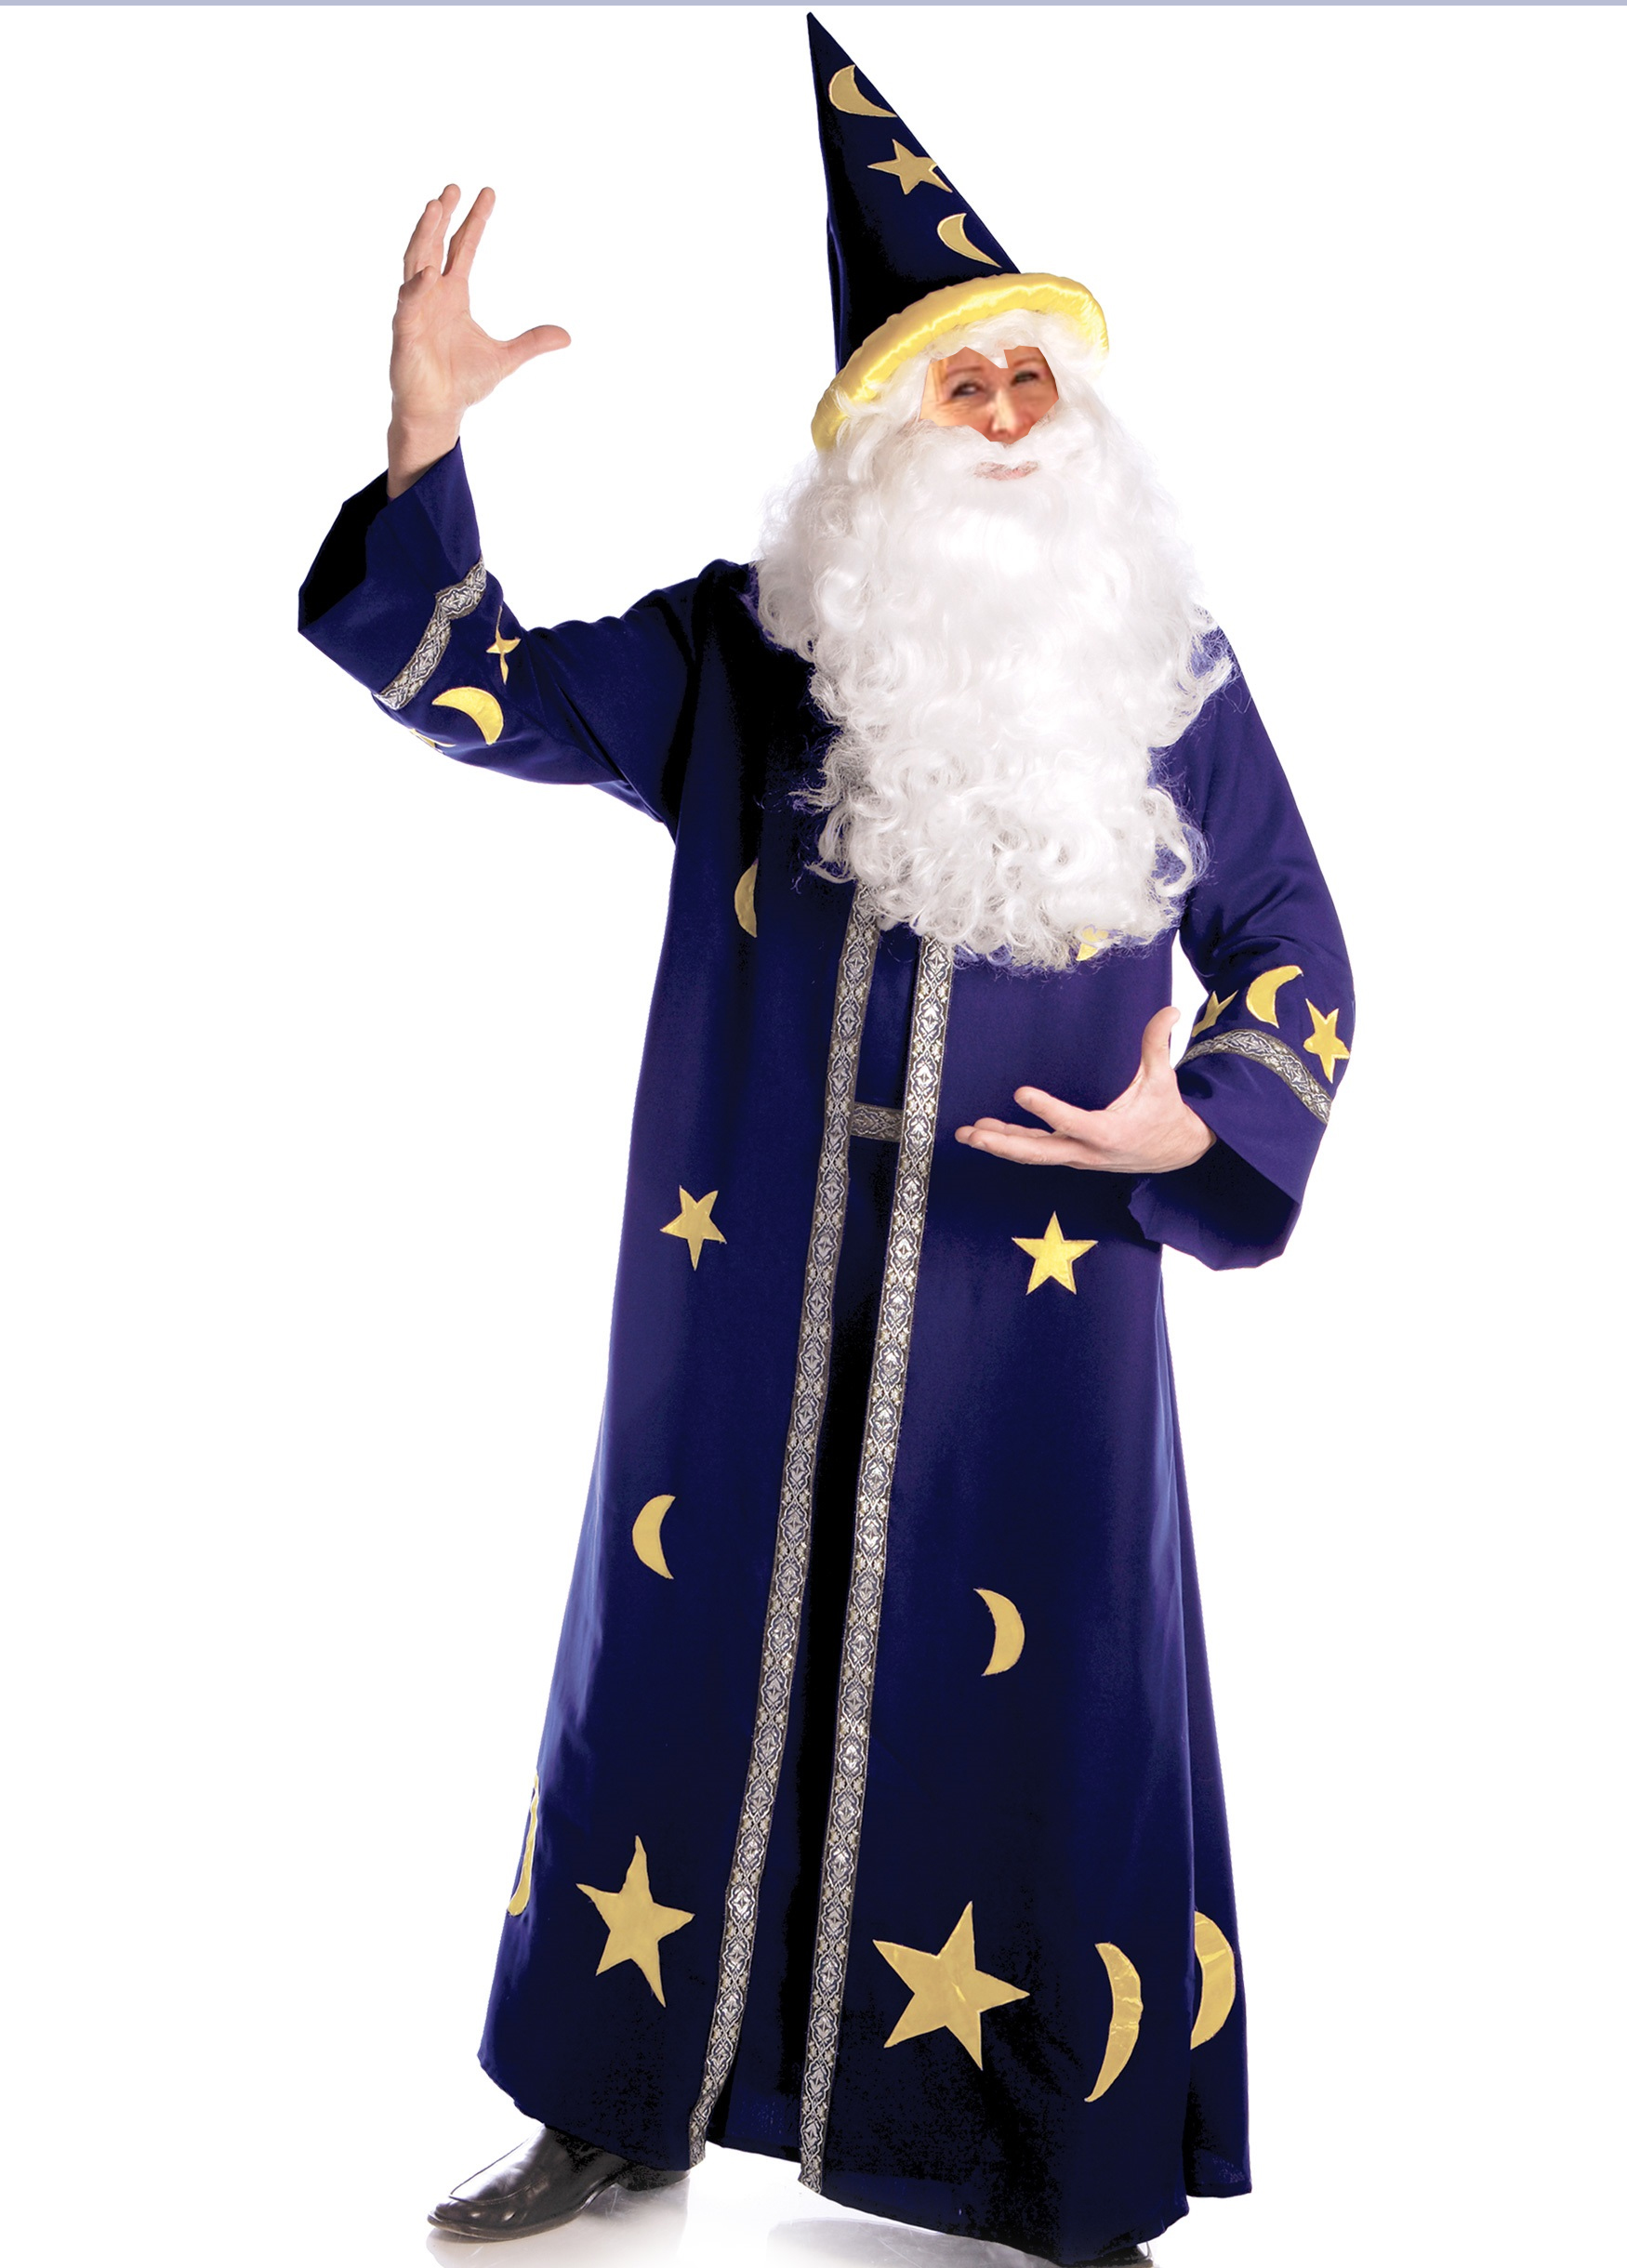 martine the wizard.jpg